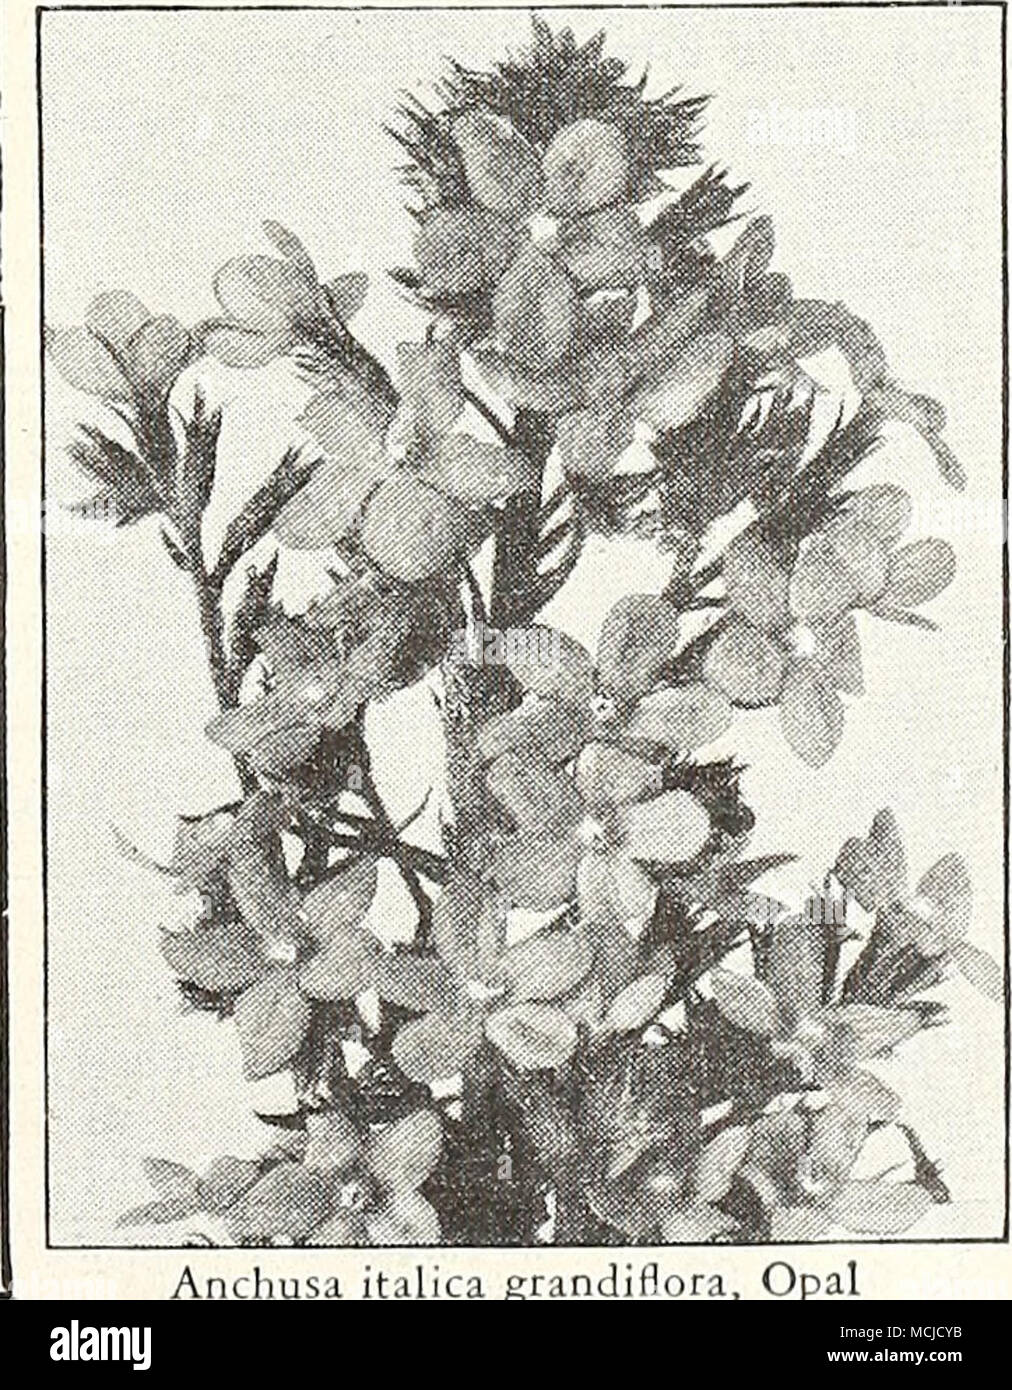 . Anchusa italica grandiflora. Opal ®=Annual; (B)=Biennial; [HHp]=Half-Hardy Perennial; [HP]=Hardy Perennial; [Tp]=Tender Perennial W - Stock Image